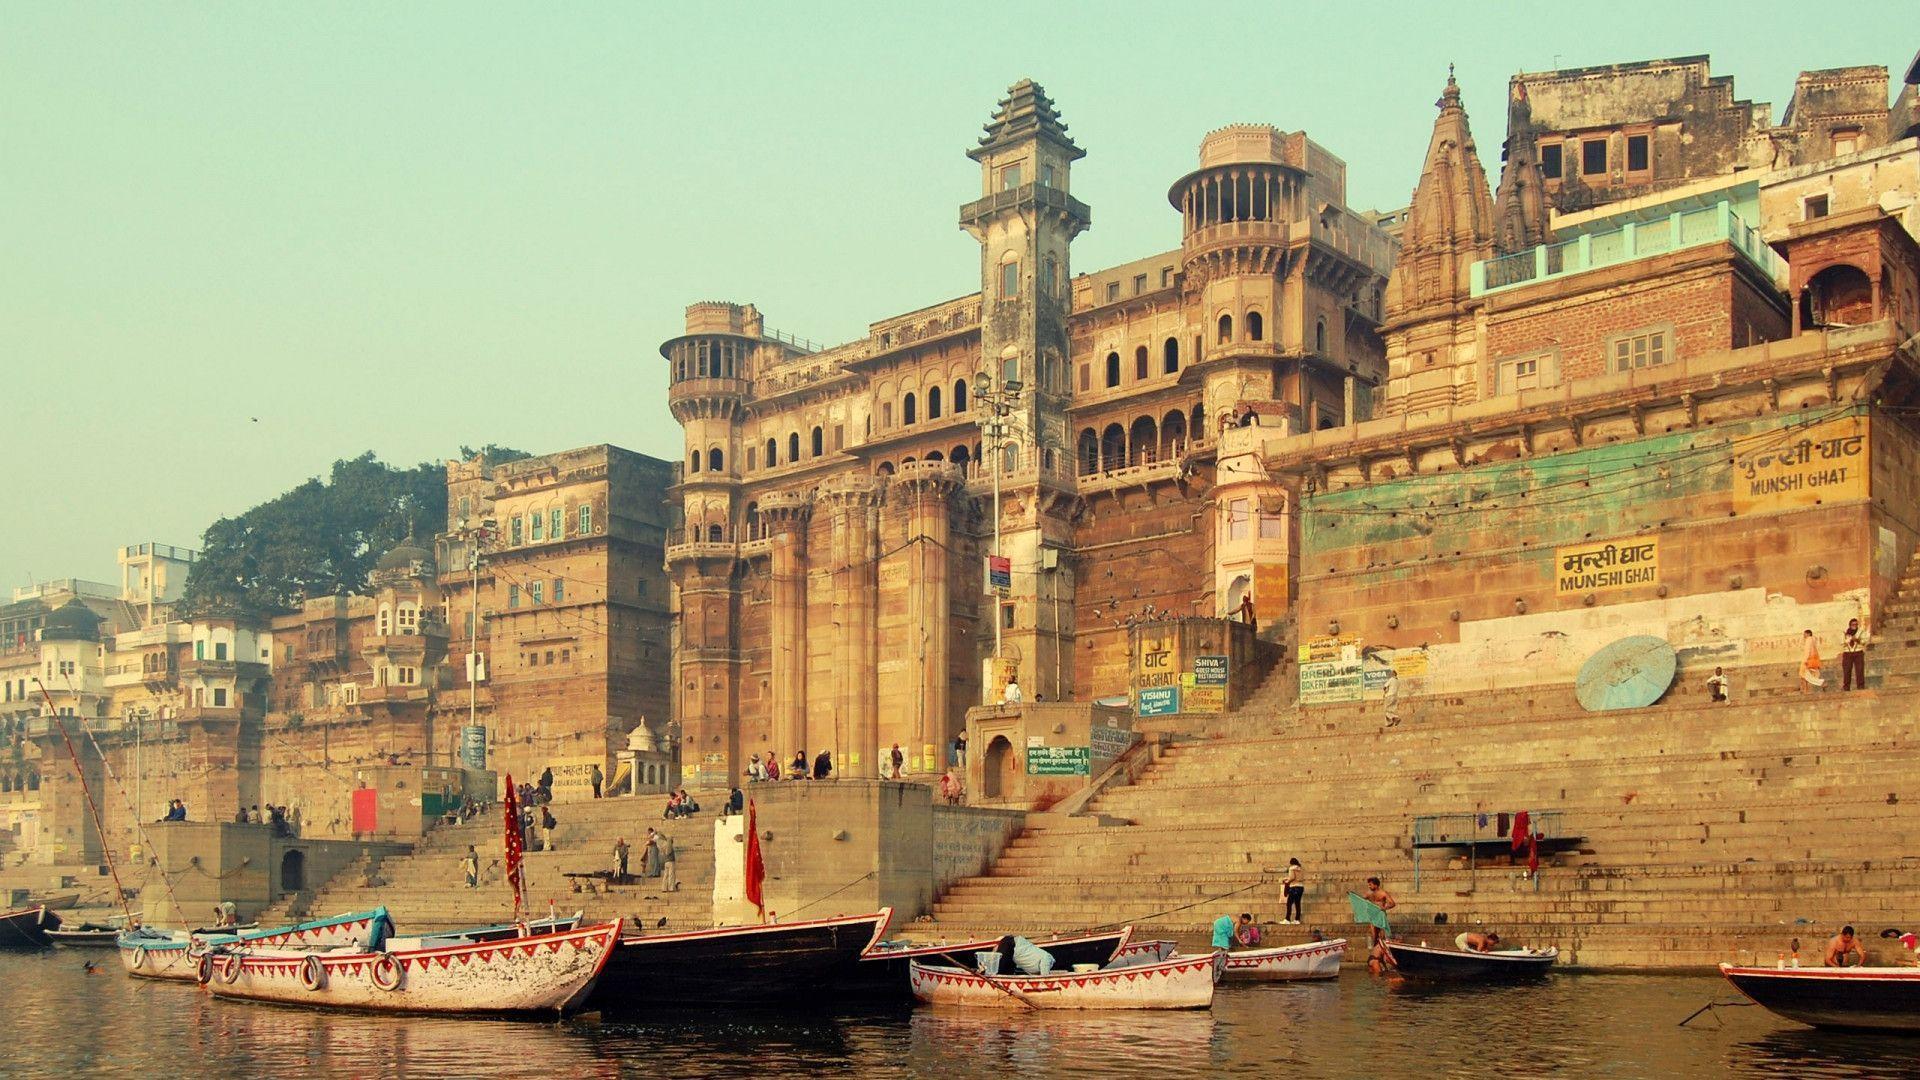 India HD Wallpapers | Sky HD Wallpaper